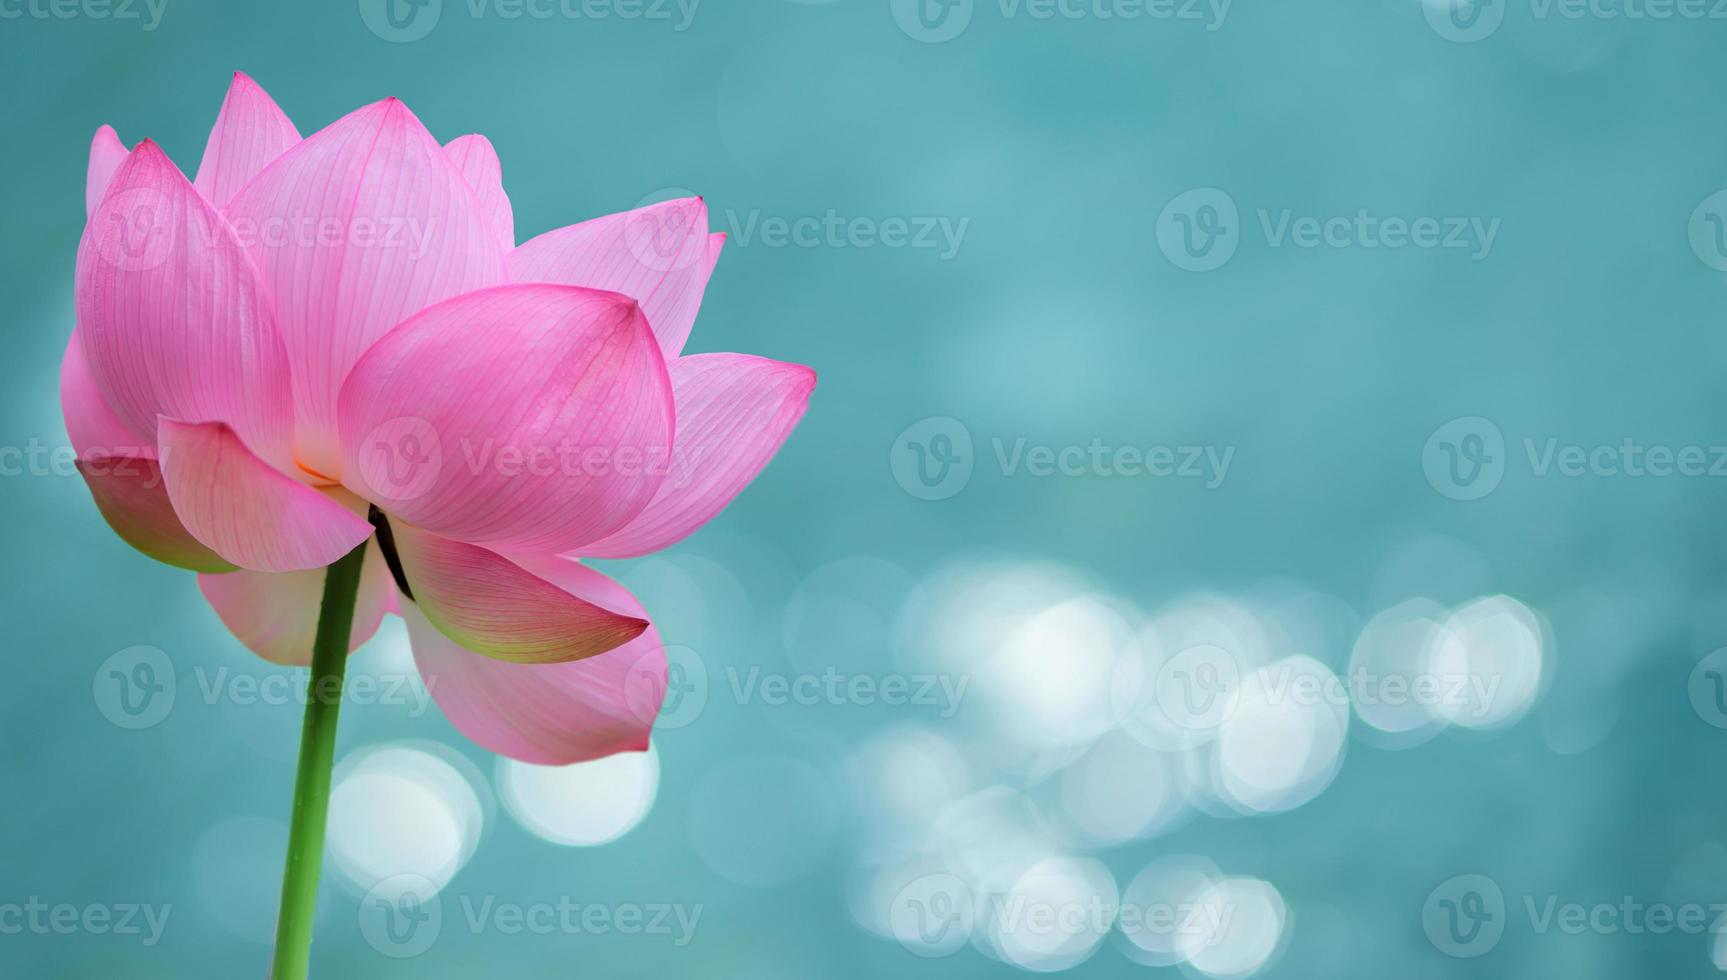 näckros blomma panorama bild foto